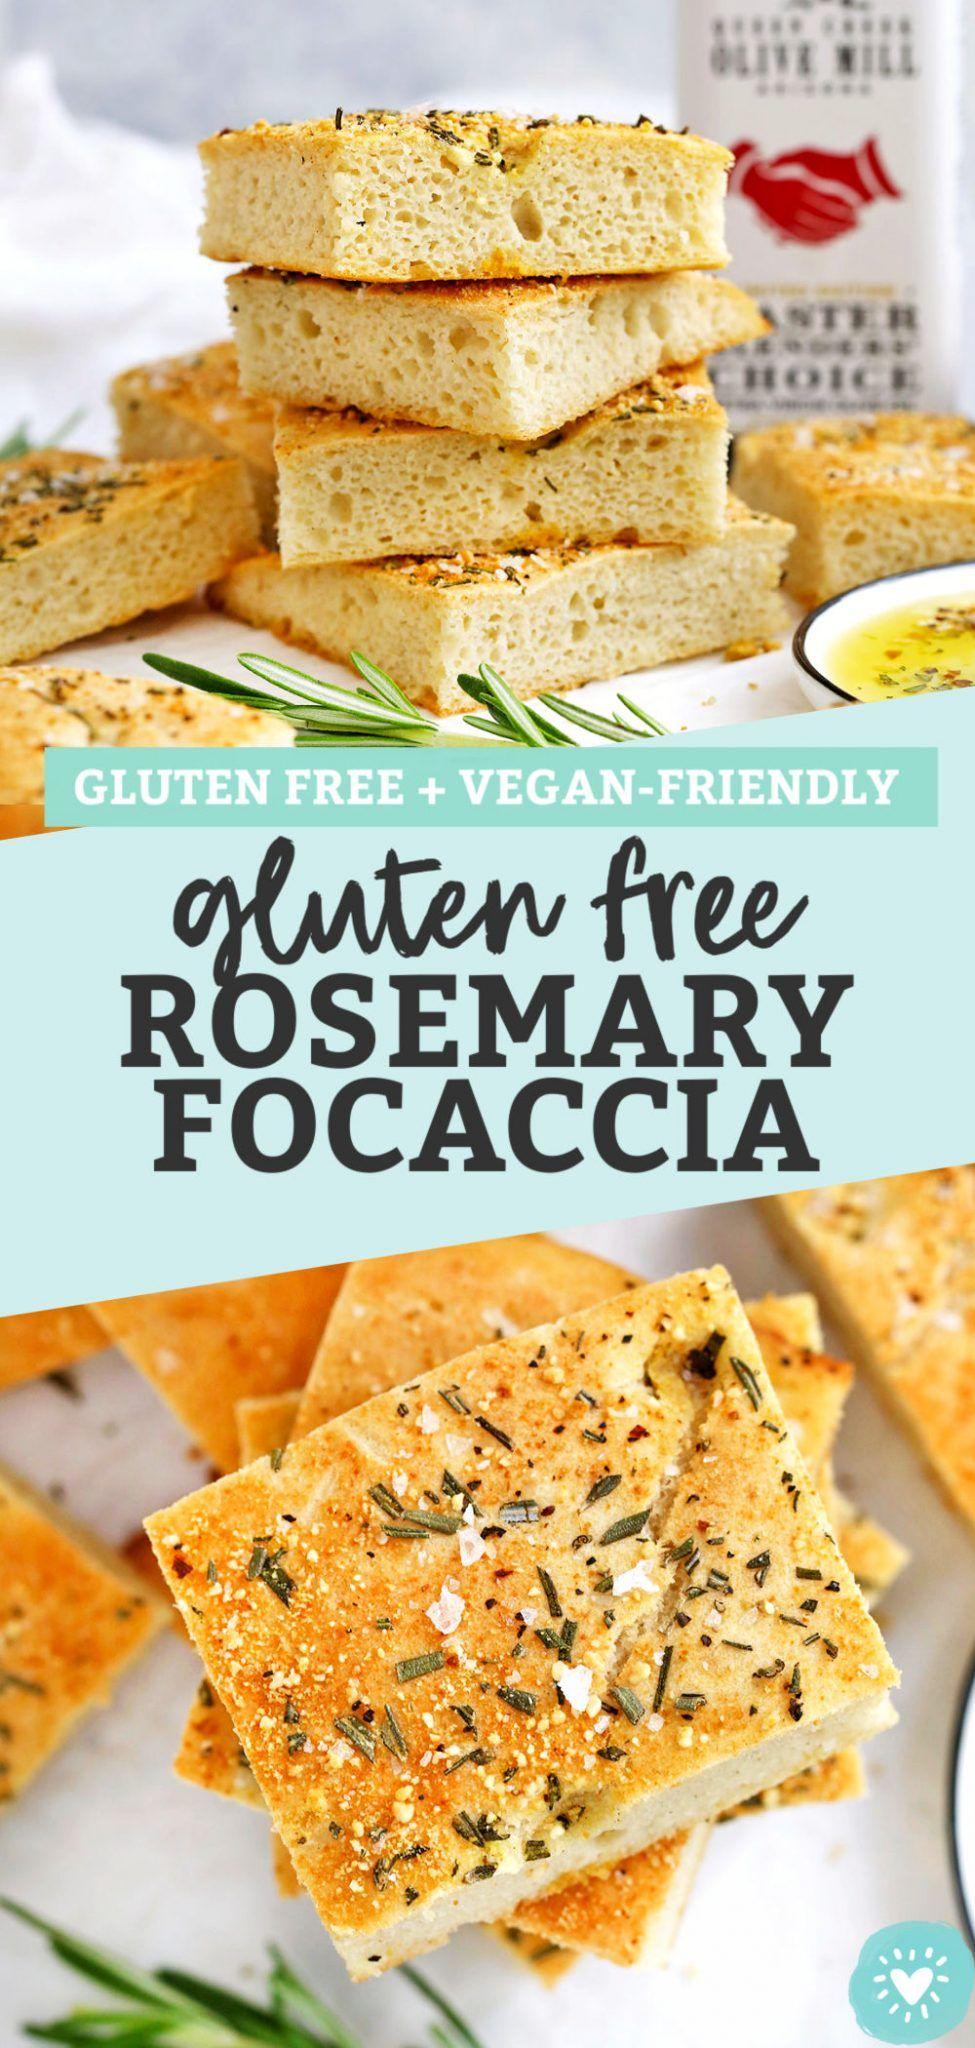 Gluten Free Focaccia With Rosemary Vegan Friendly Recipe In 2020 Gluten Free Focaccia Focaccia Food